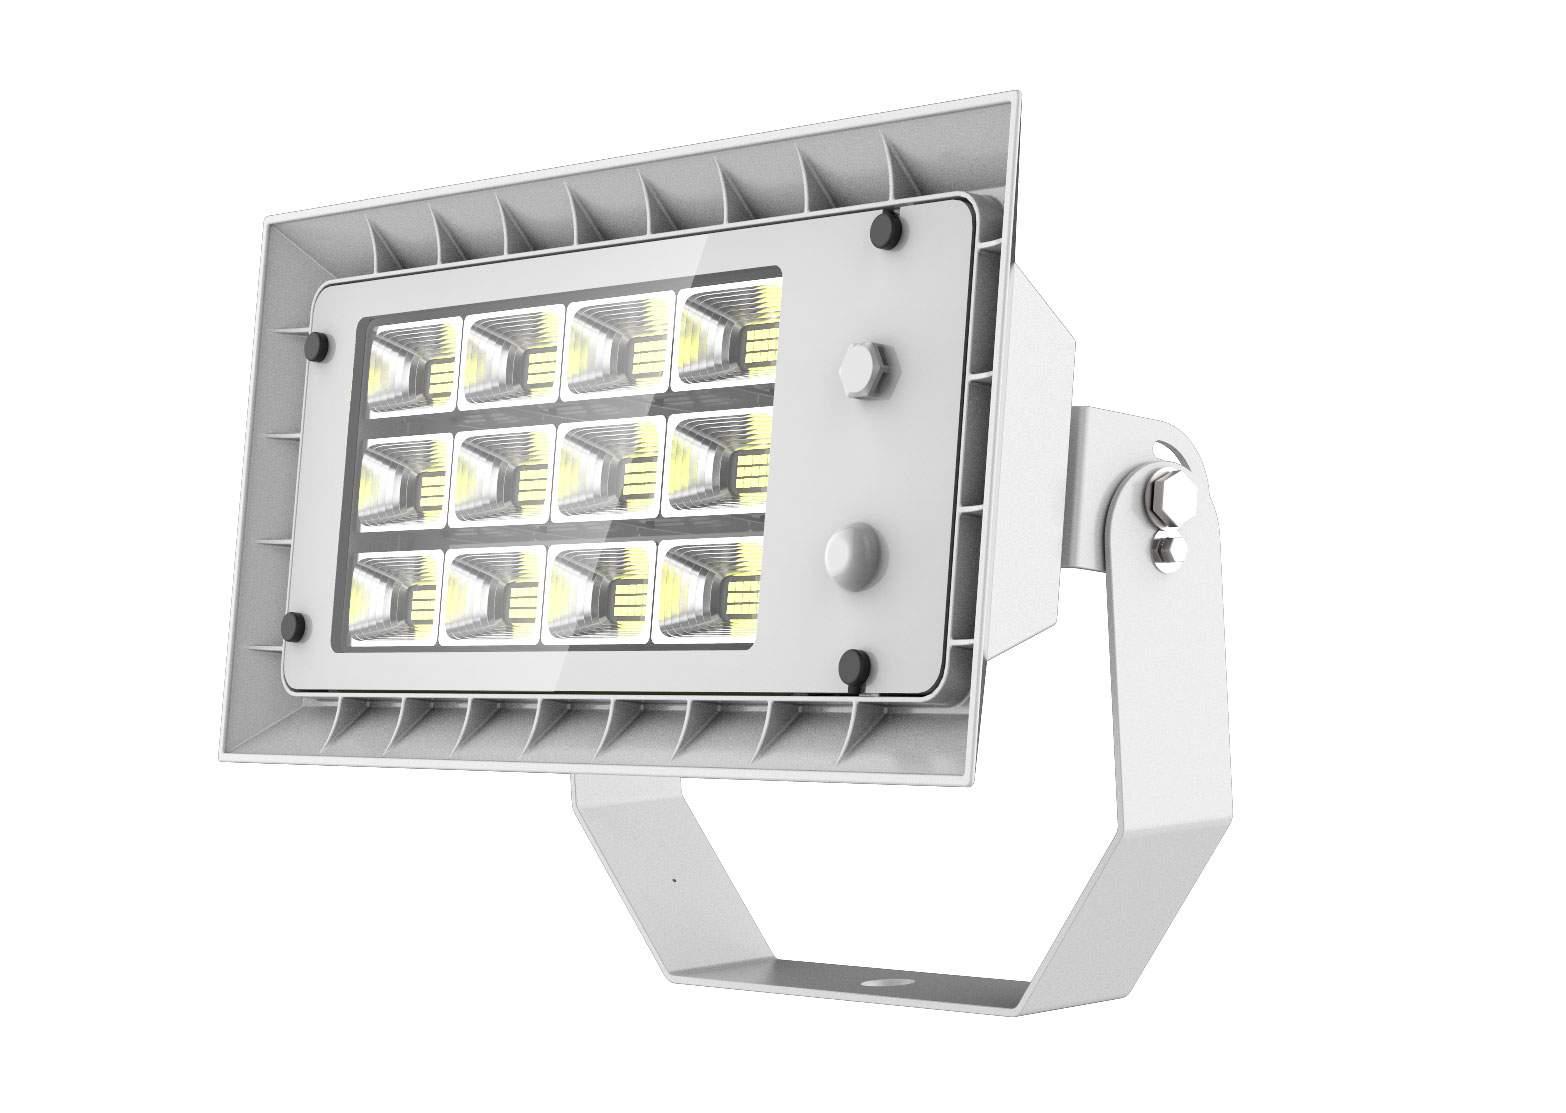 LED Prožektor PROLUMEN FL3 DALI valge  80W 11200lm  60x90° IP66 päevavalge 4000K